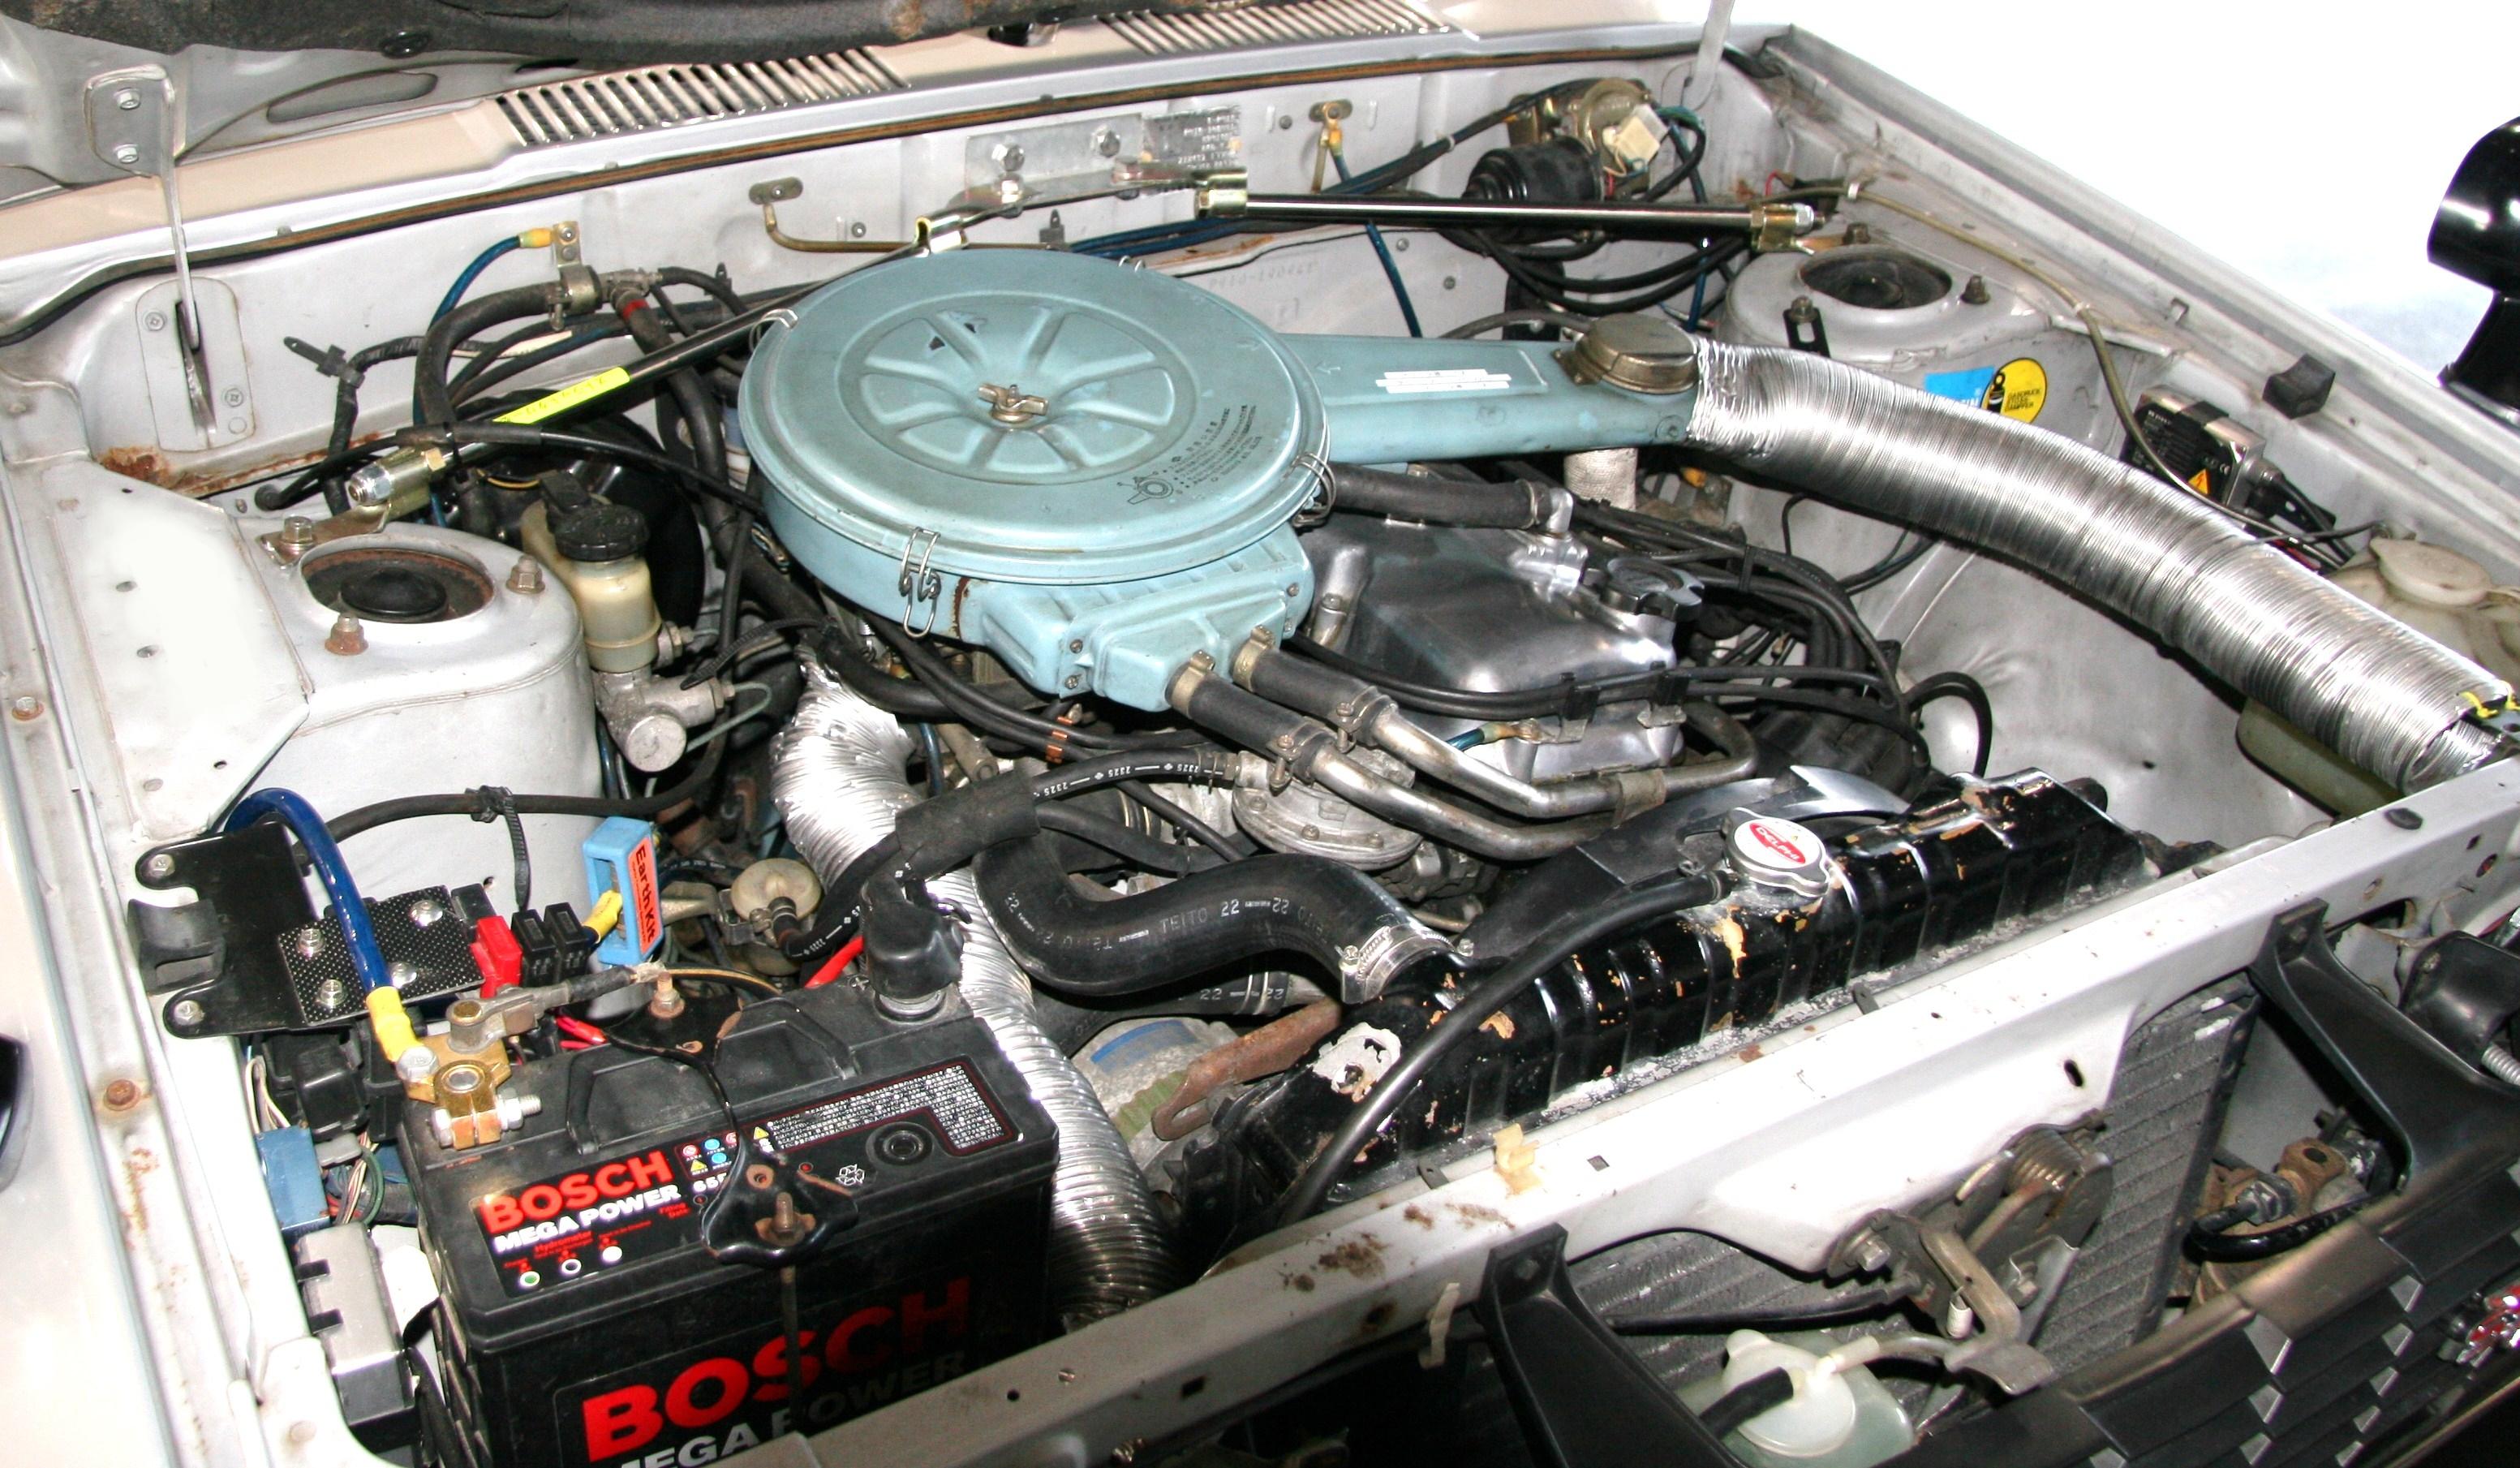 File:Nissan Bluebird 910 SSS engine room.jpg - Wikimedia ...